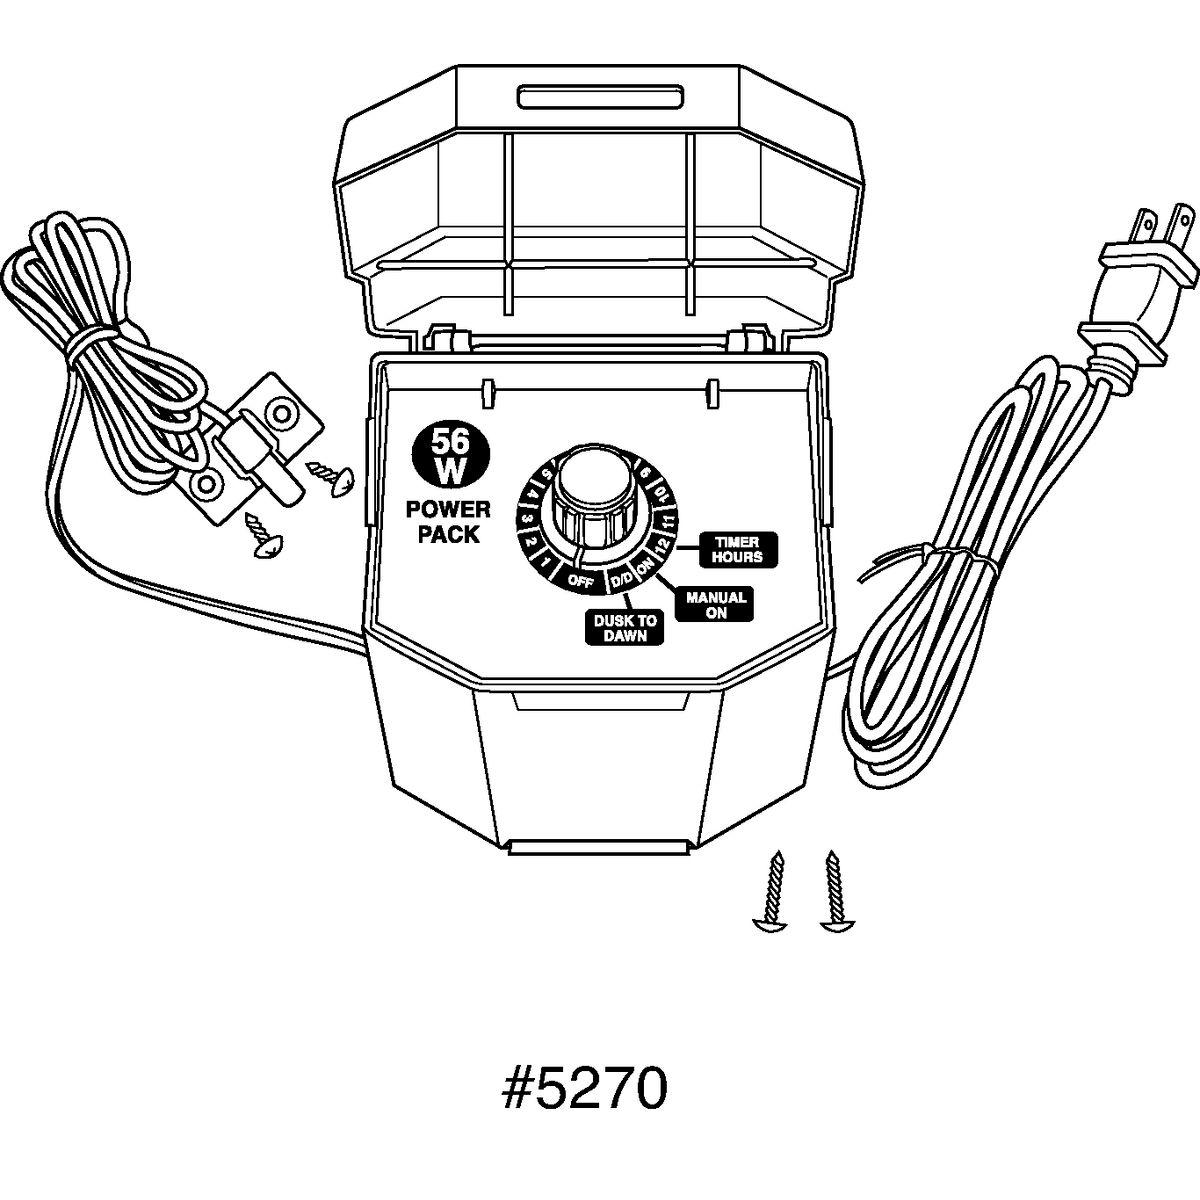 Progp827031prodimage Progp8270lineart: Hubbell Lighting Inverter Wiring Diagram At Chusao.net